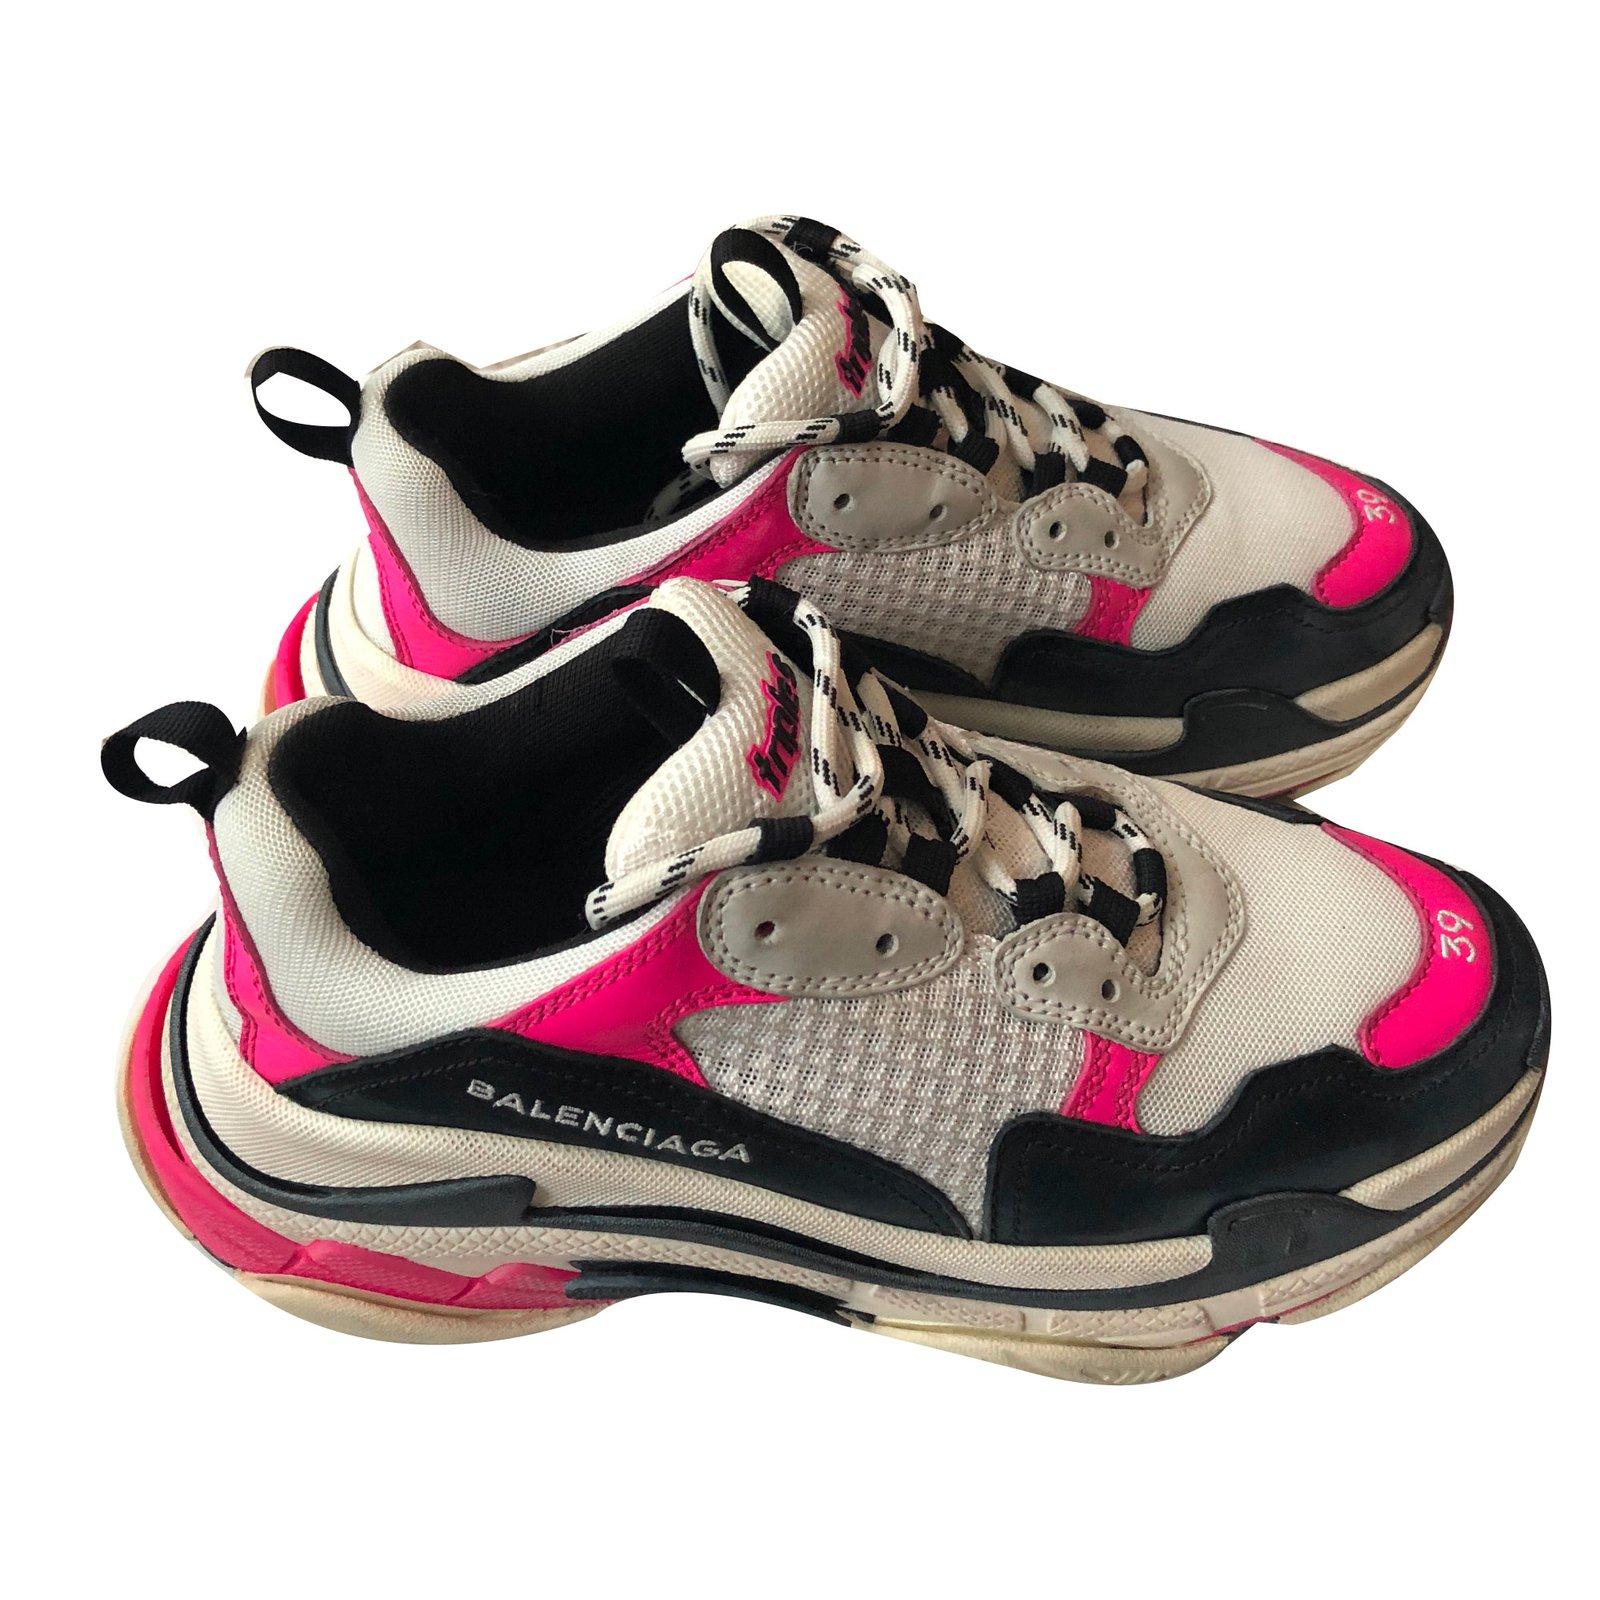 0707eaa7b14e Balenciaga Triple S Sneakers Sneakers Other Multiple colors ref.79554